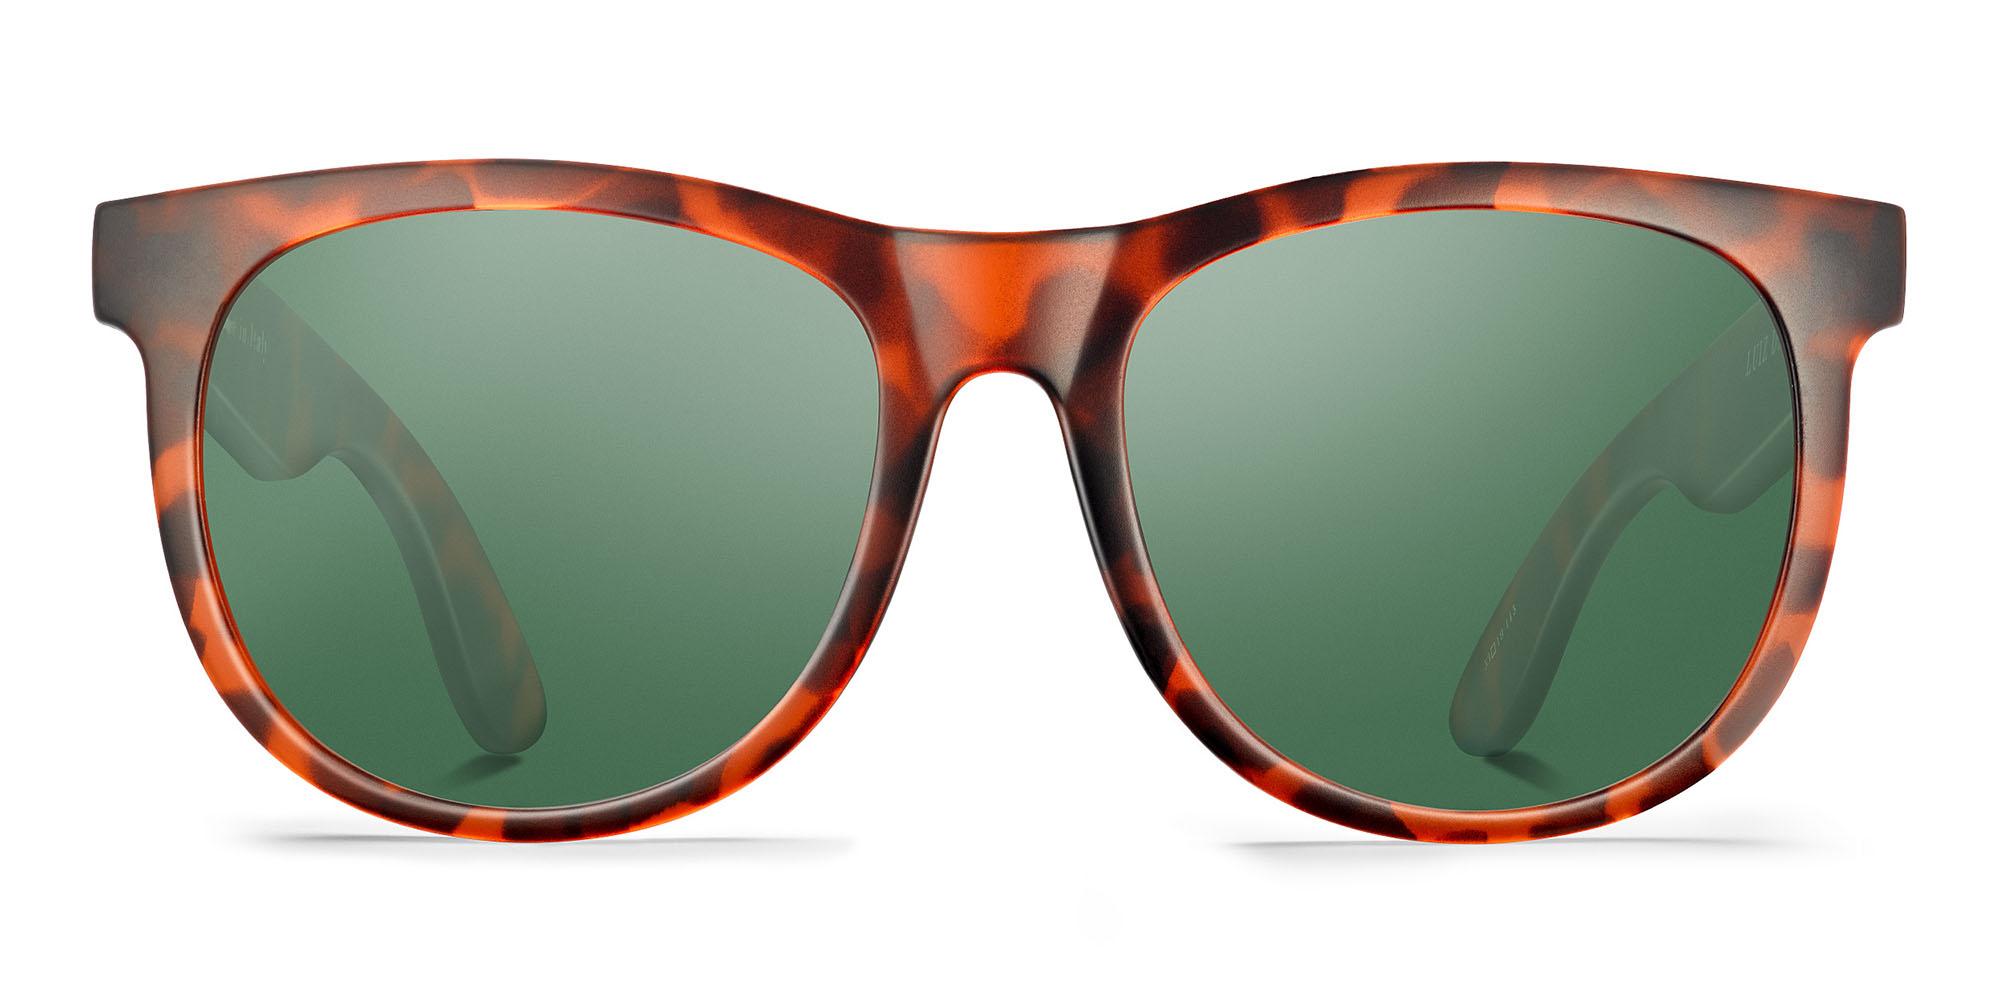 sunglasses_eyewear_rotoise